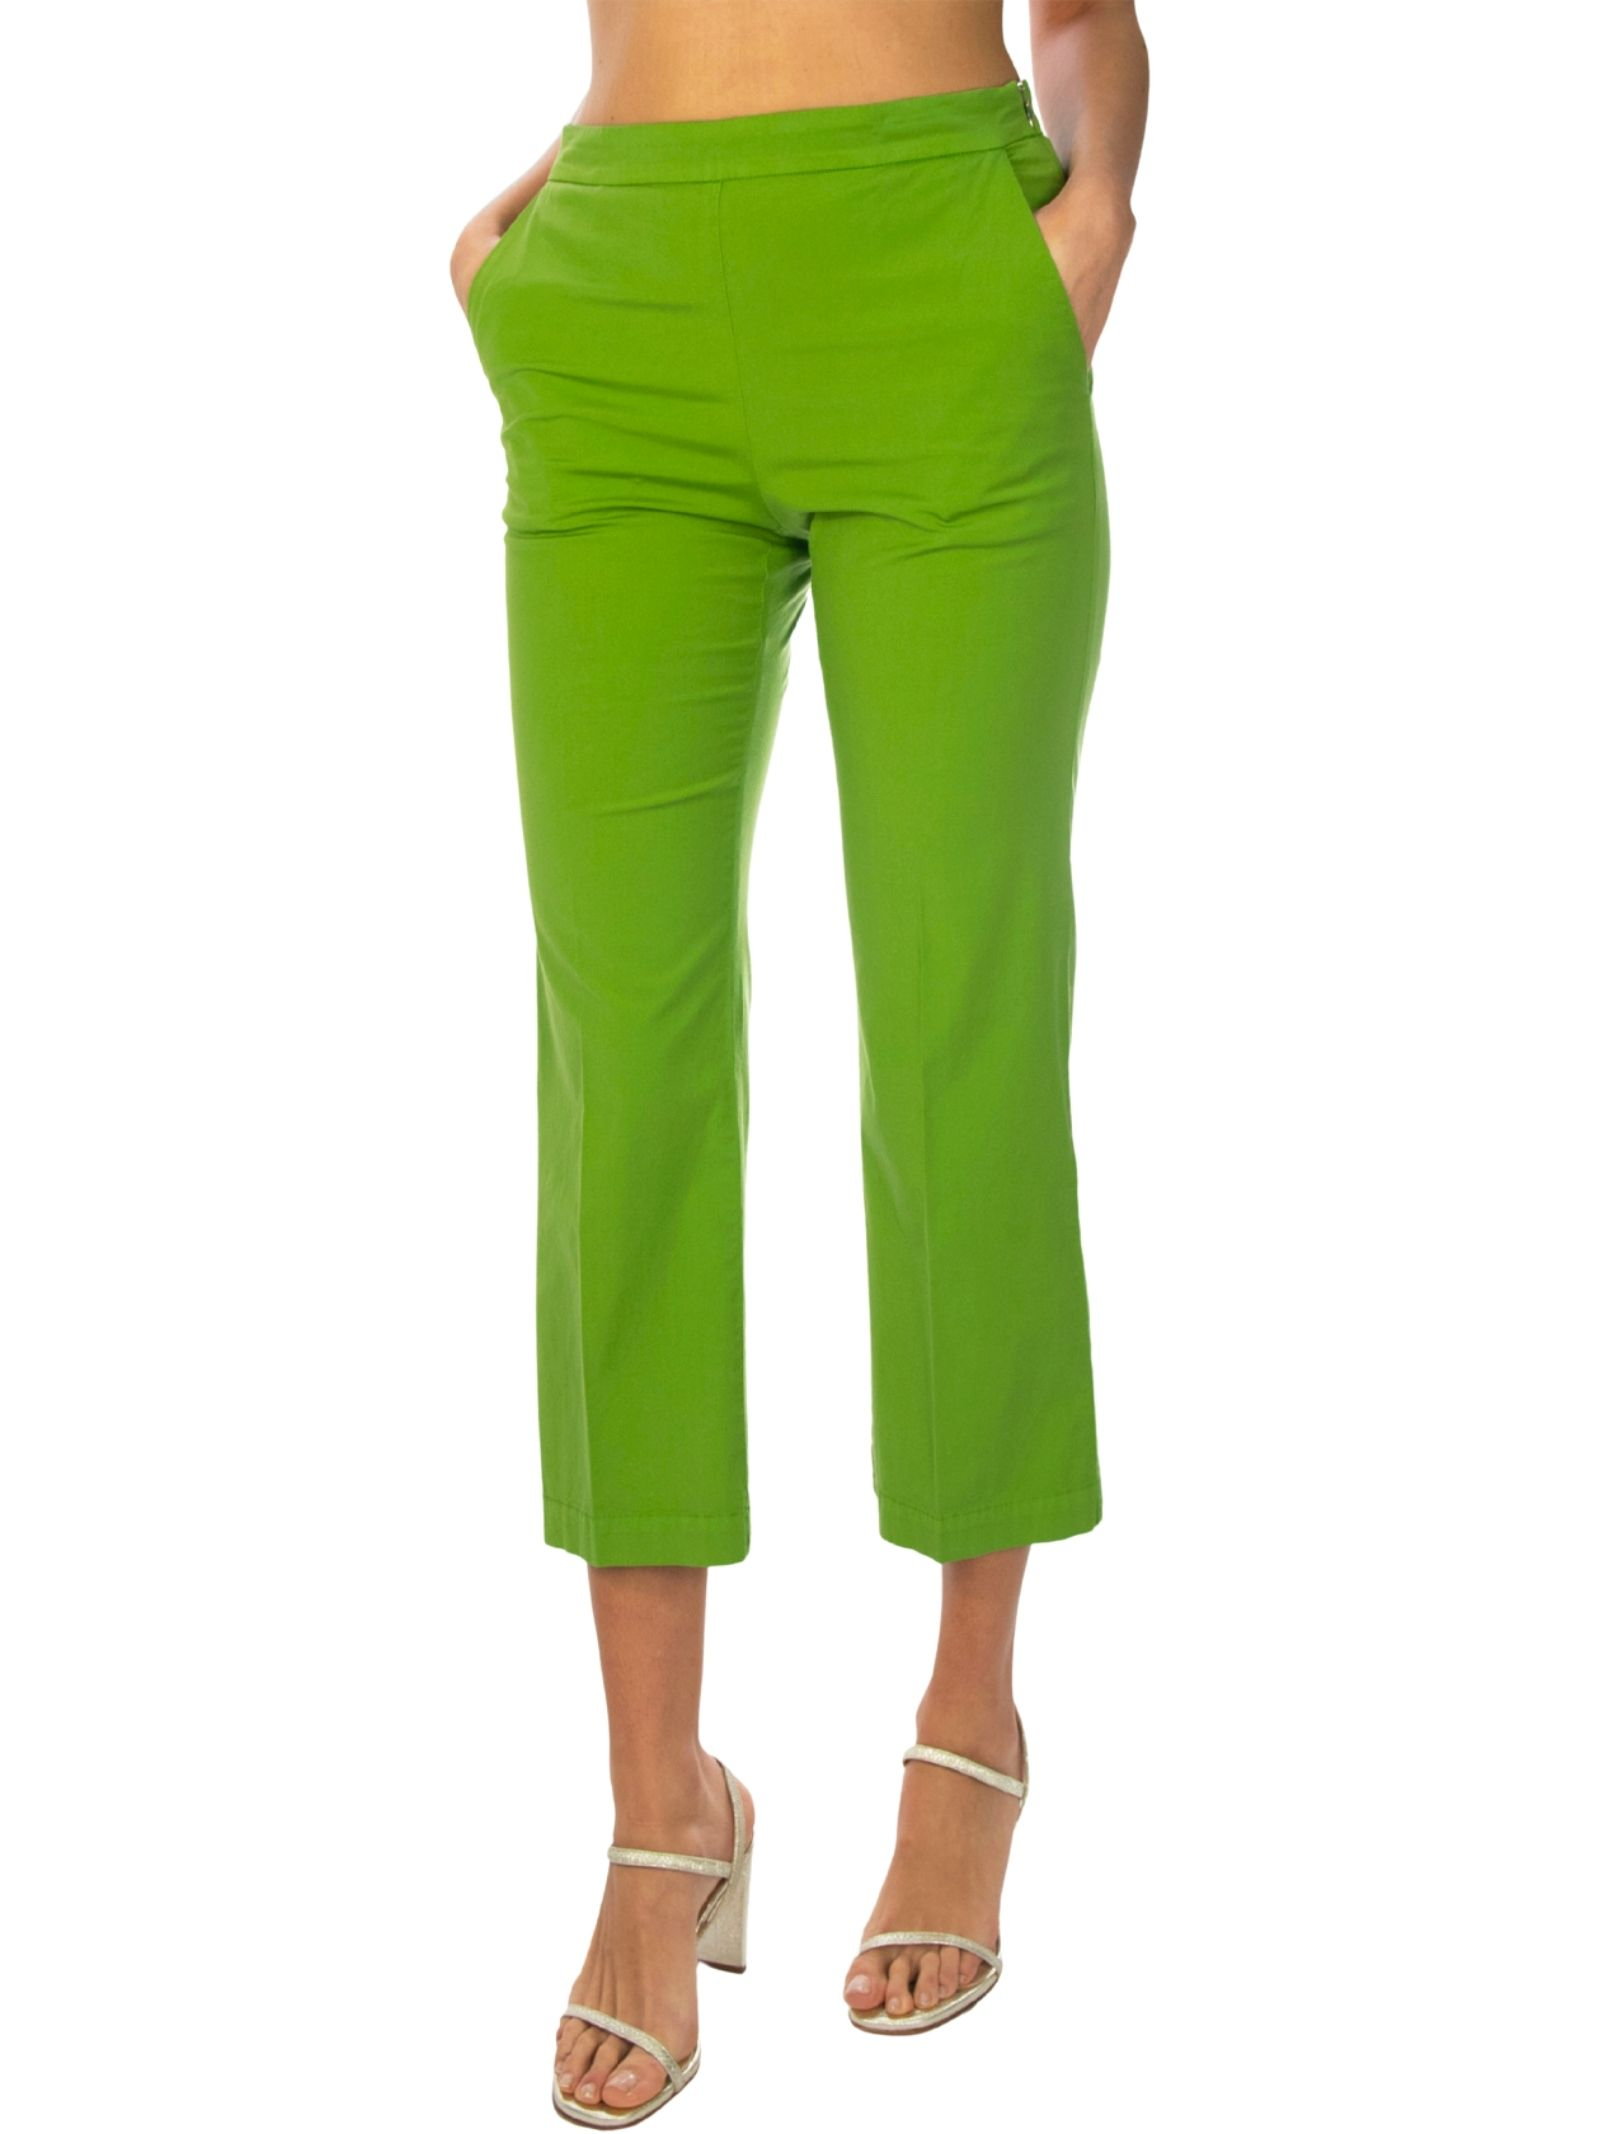 Abbigliamento Donna Pantalone Stretch Satin Cotton Verde Maliparmi | Gonne e Pantaloni | JH71441013760131